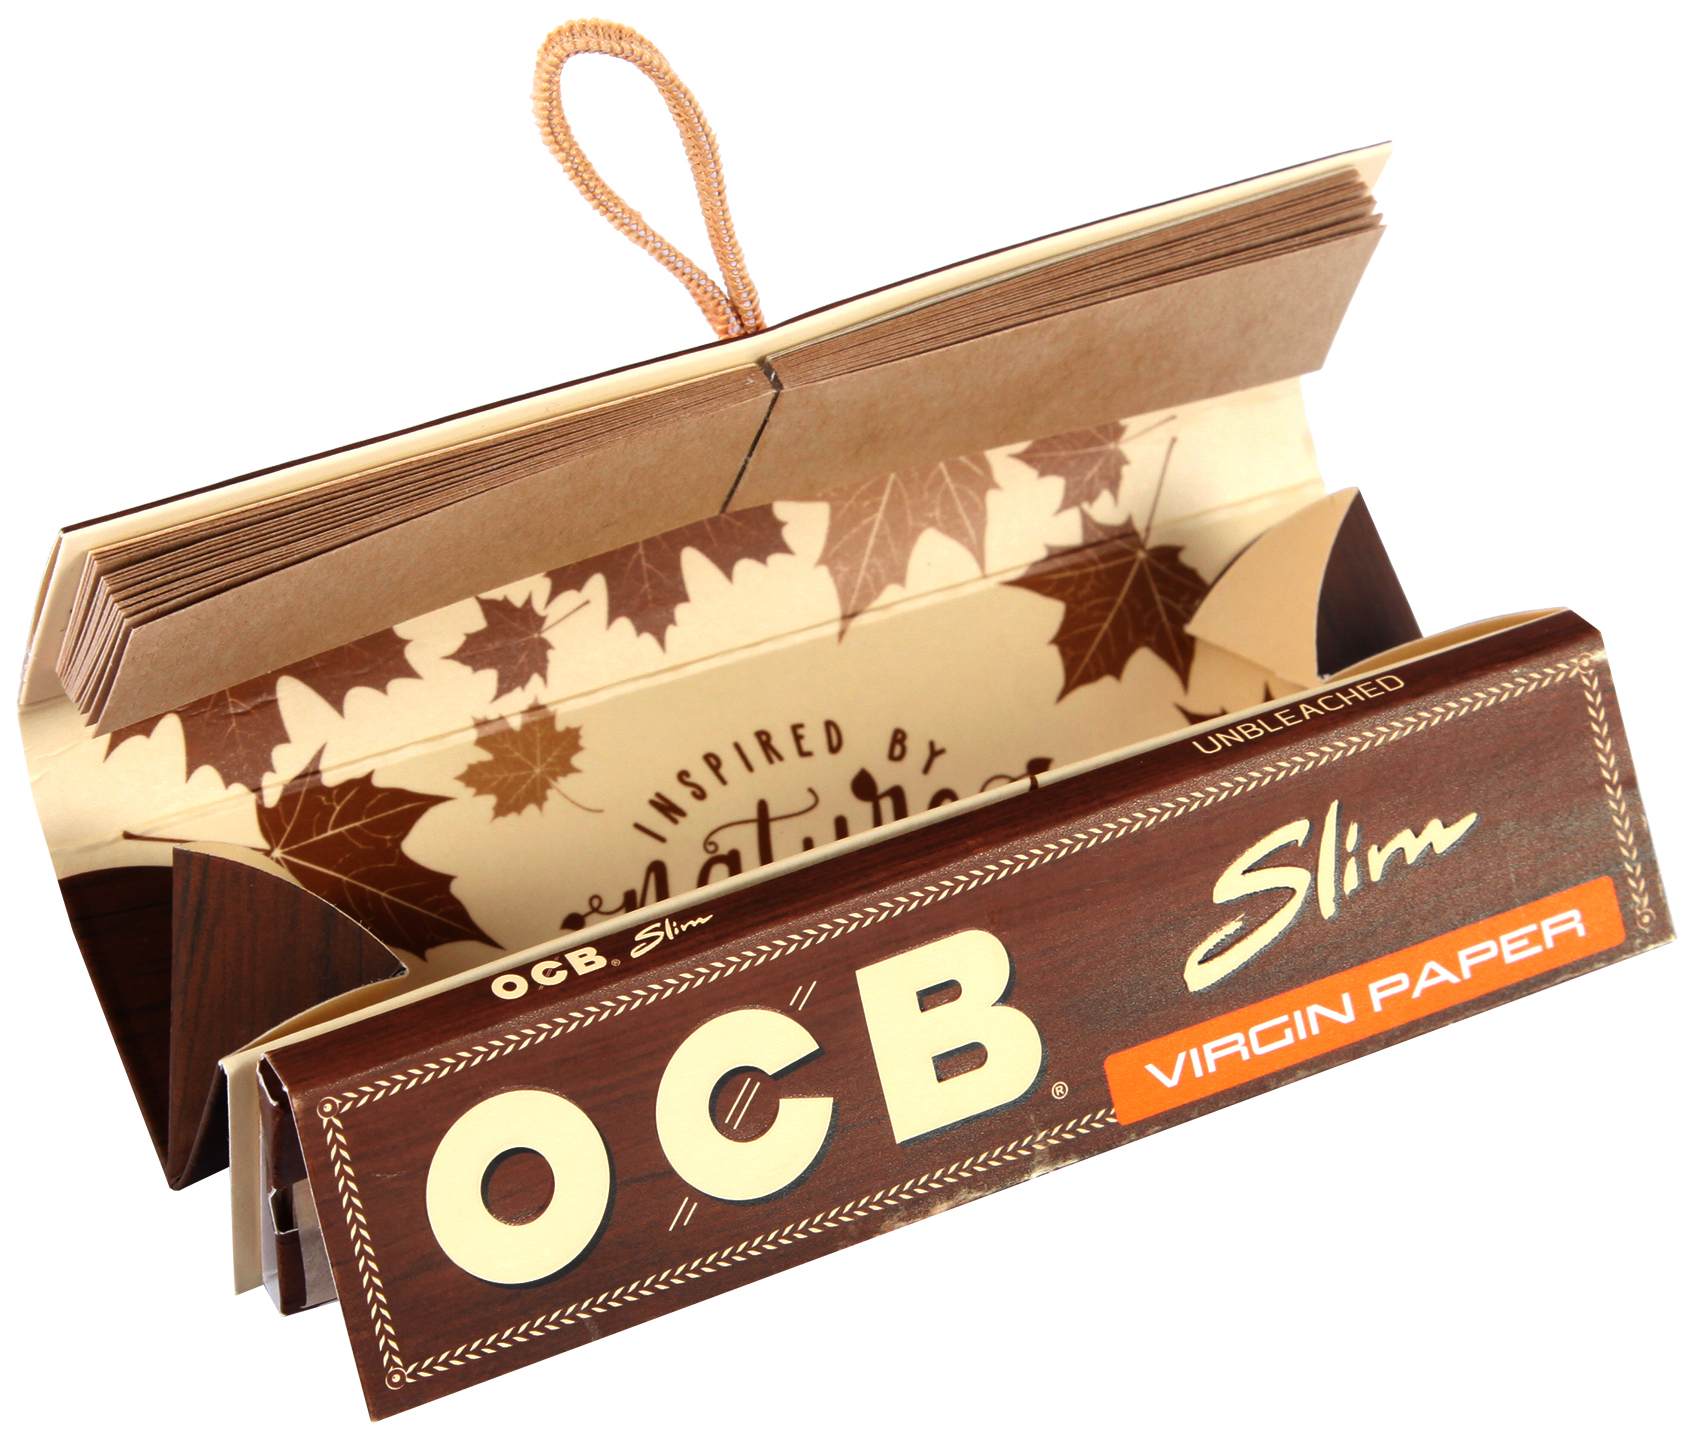 OCB Unbleached Roll Kit Virgin Paper